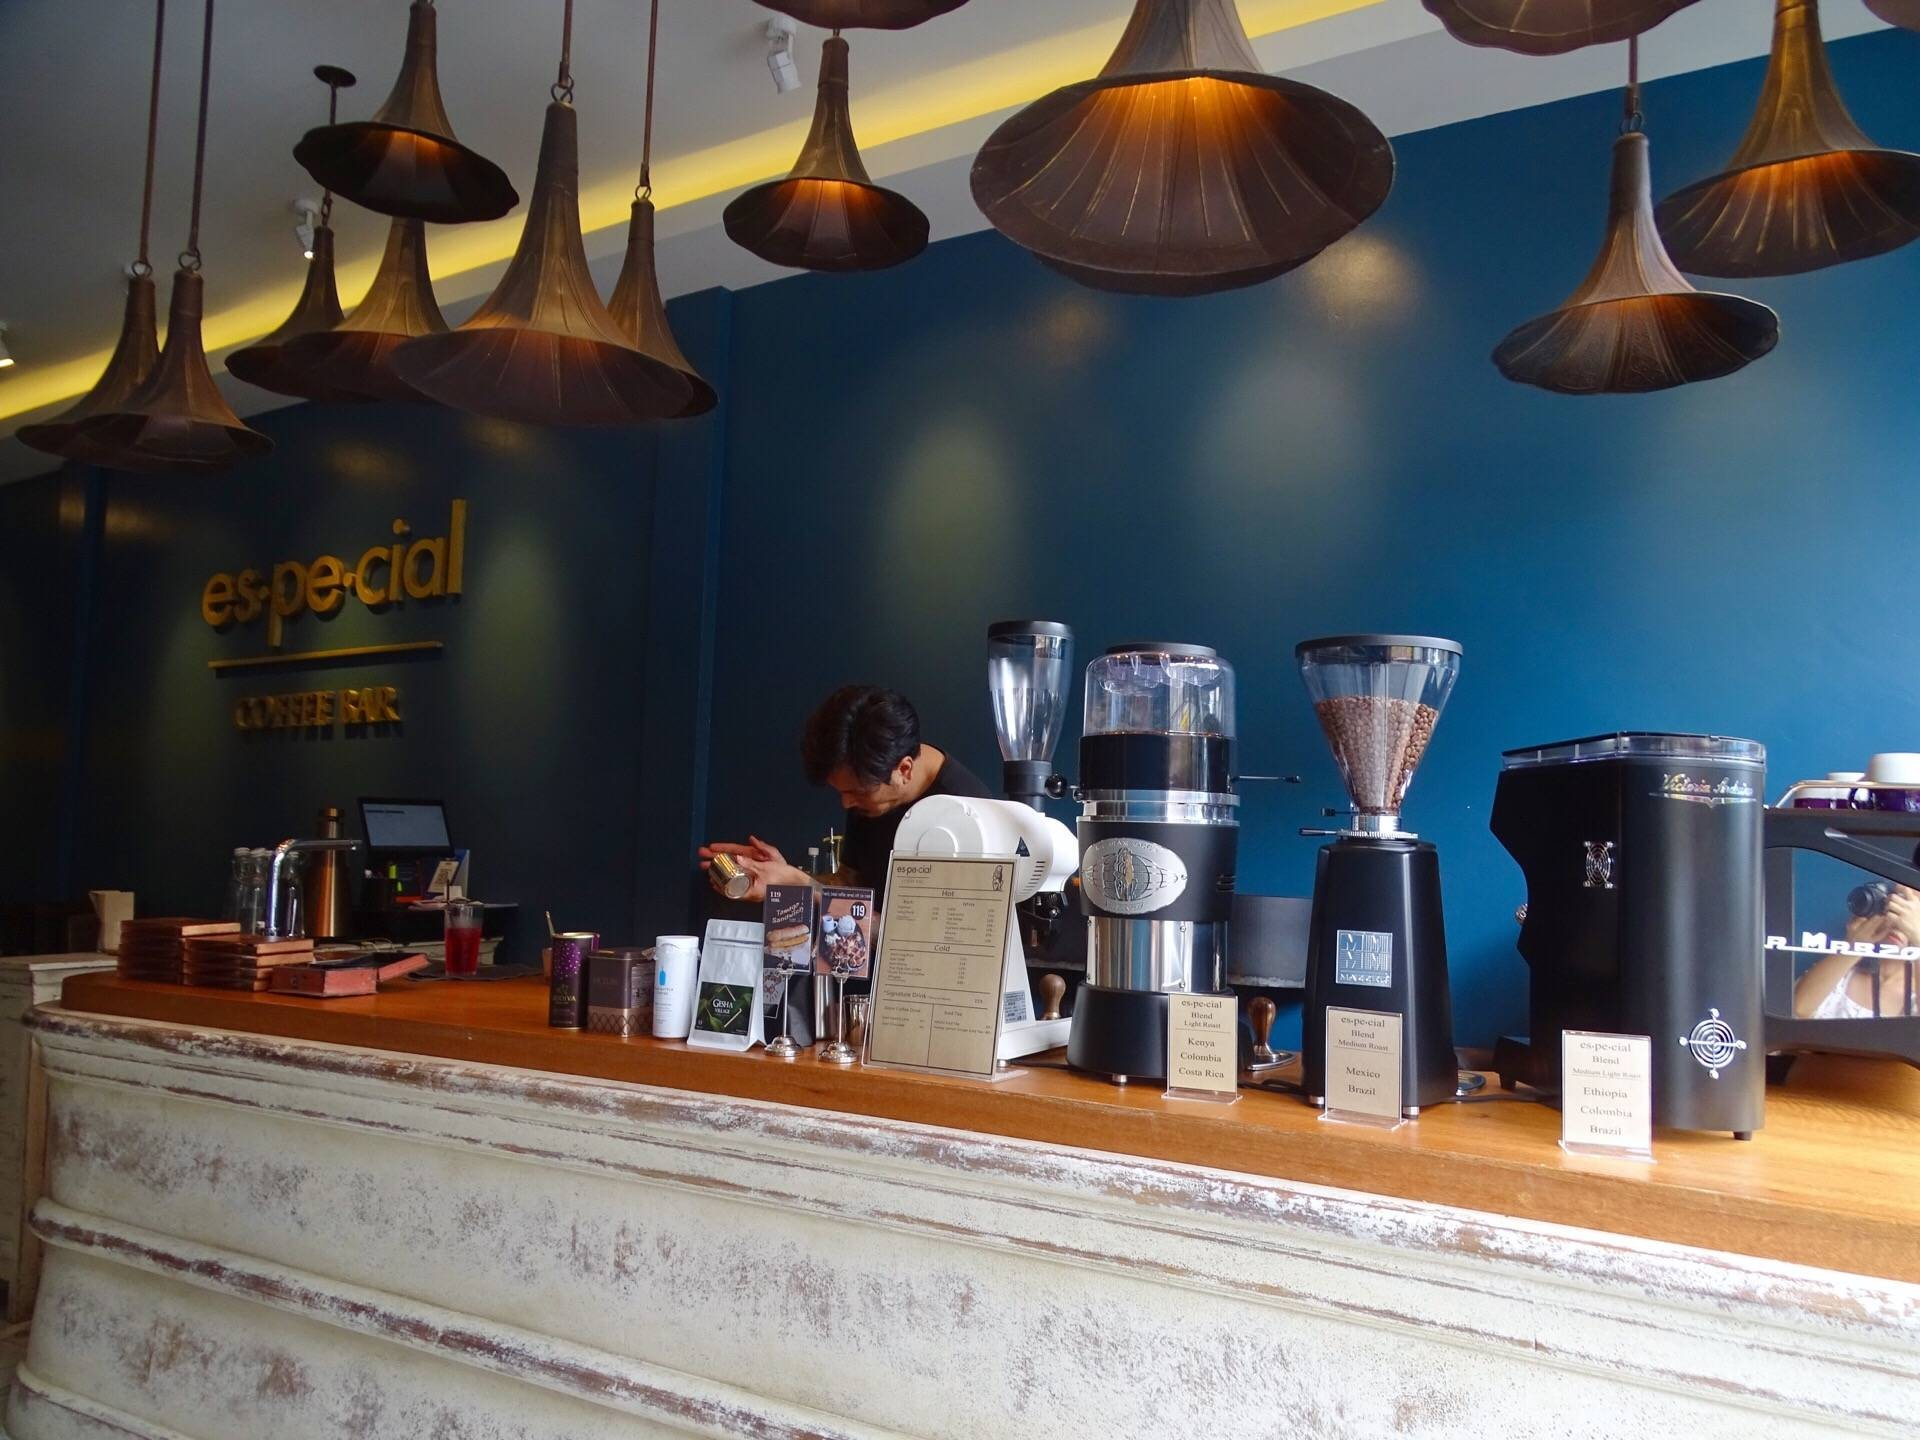 Es-pe-cial Coffee Bar